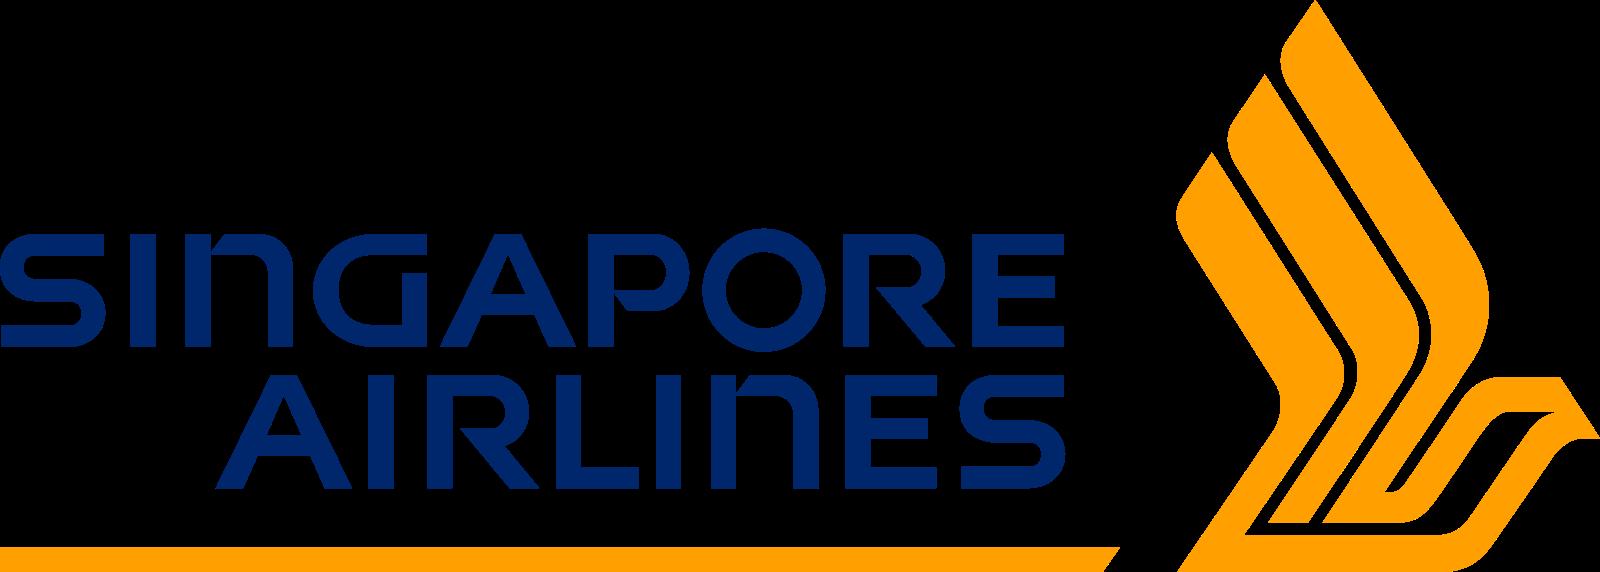 singapore airlines logo 4 - Singapore Airlines Logo